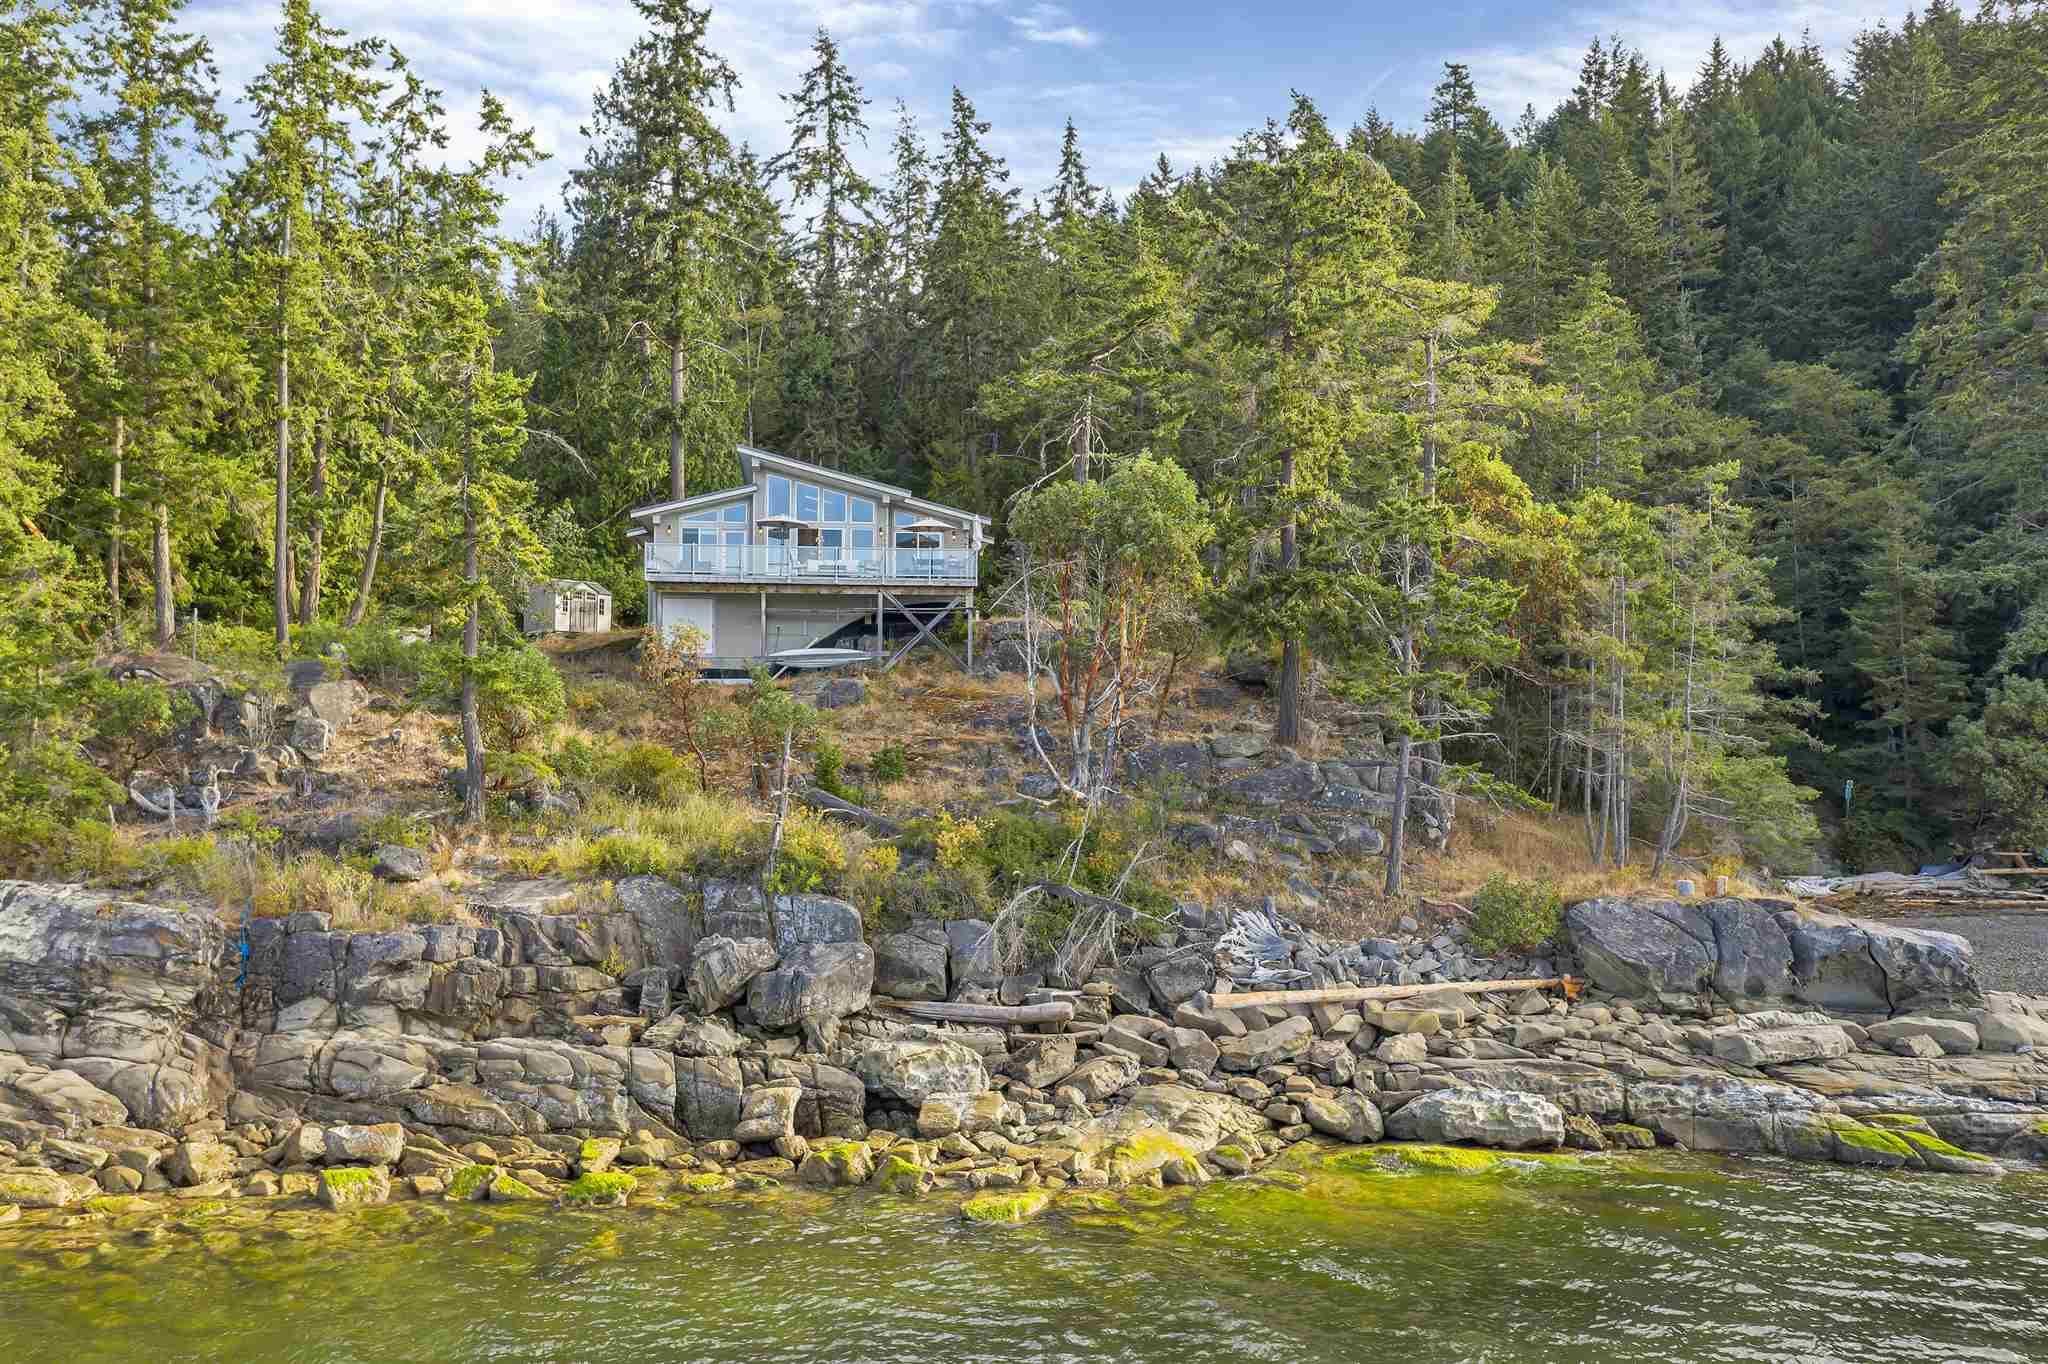 Main Photo: 320 GANNER Road: Galiano Island House for sale (Islands-Van. & Gulf)  : MLS®# R2607616